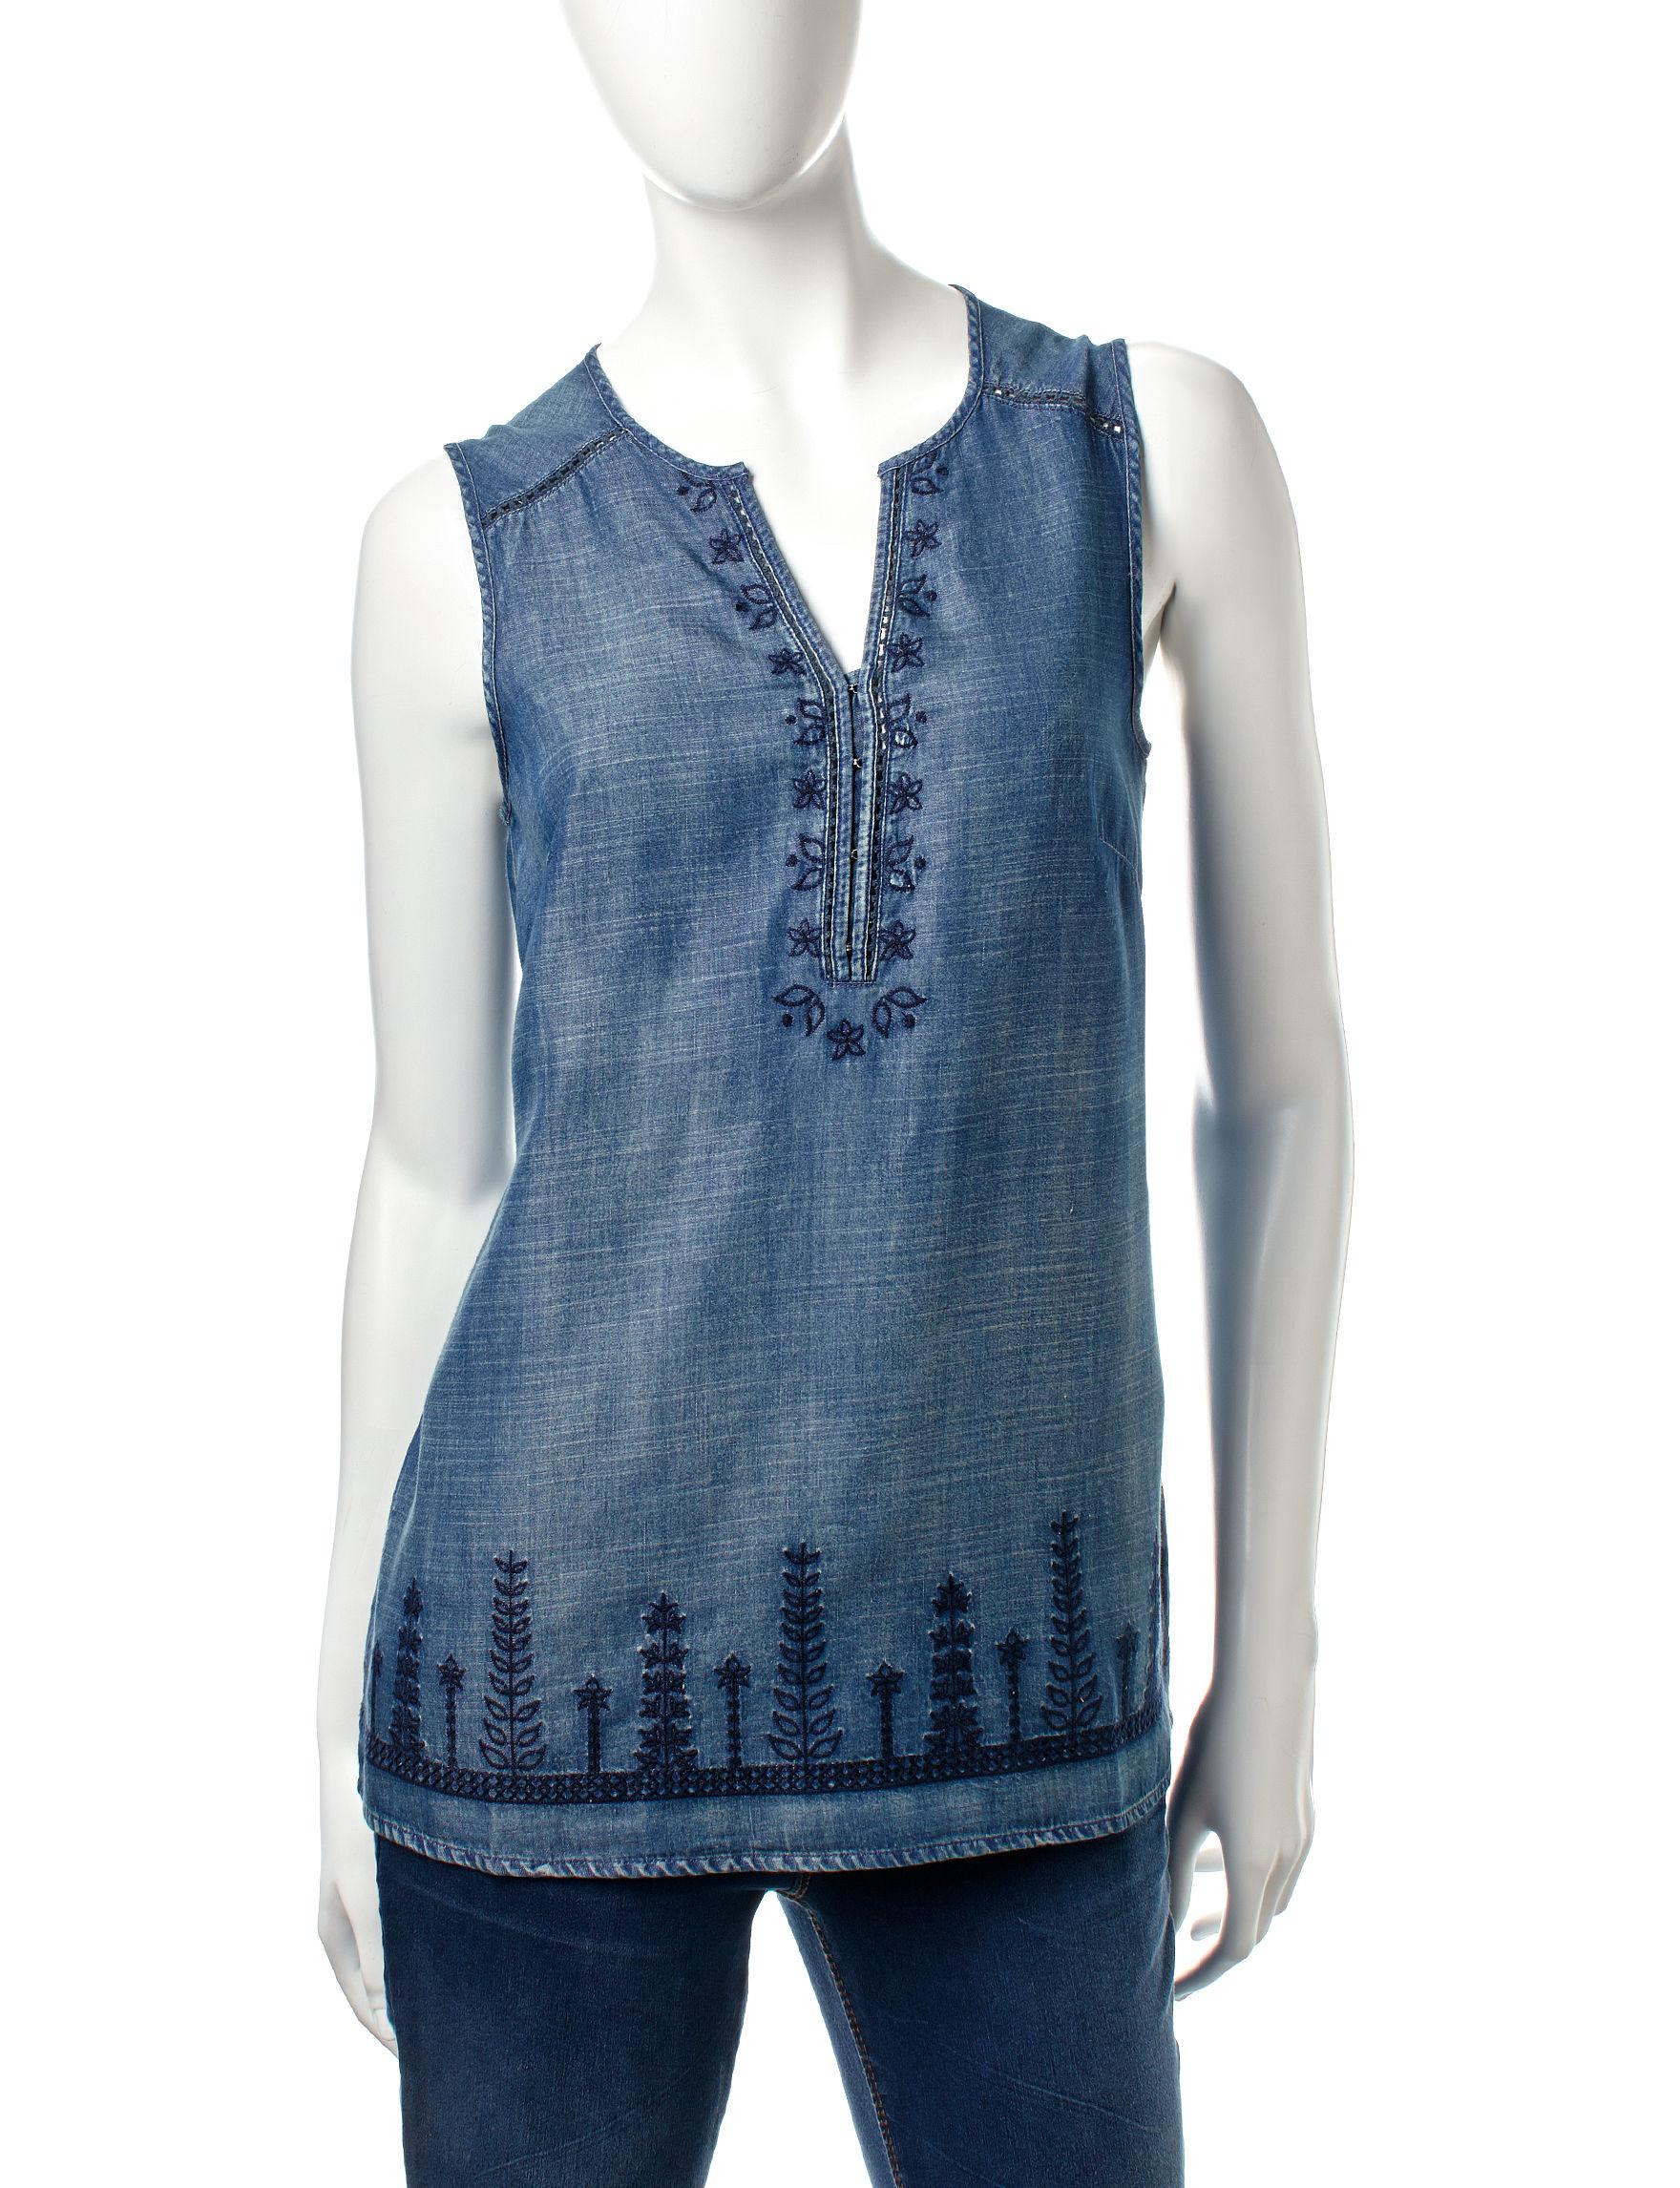 Vintage America Blues Indigo Shirts & Blouses